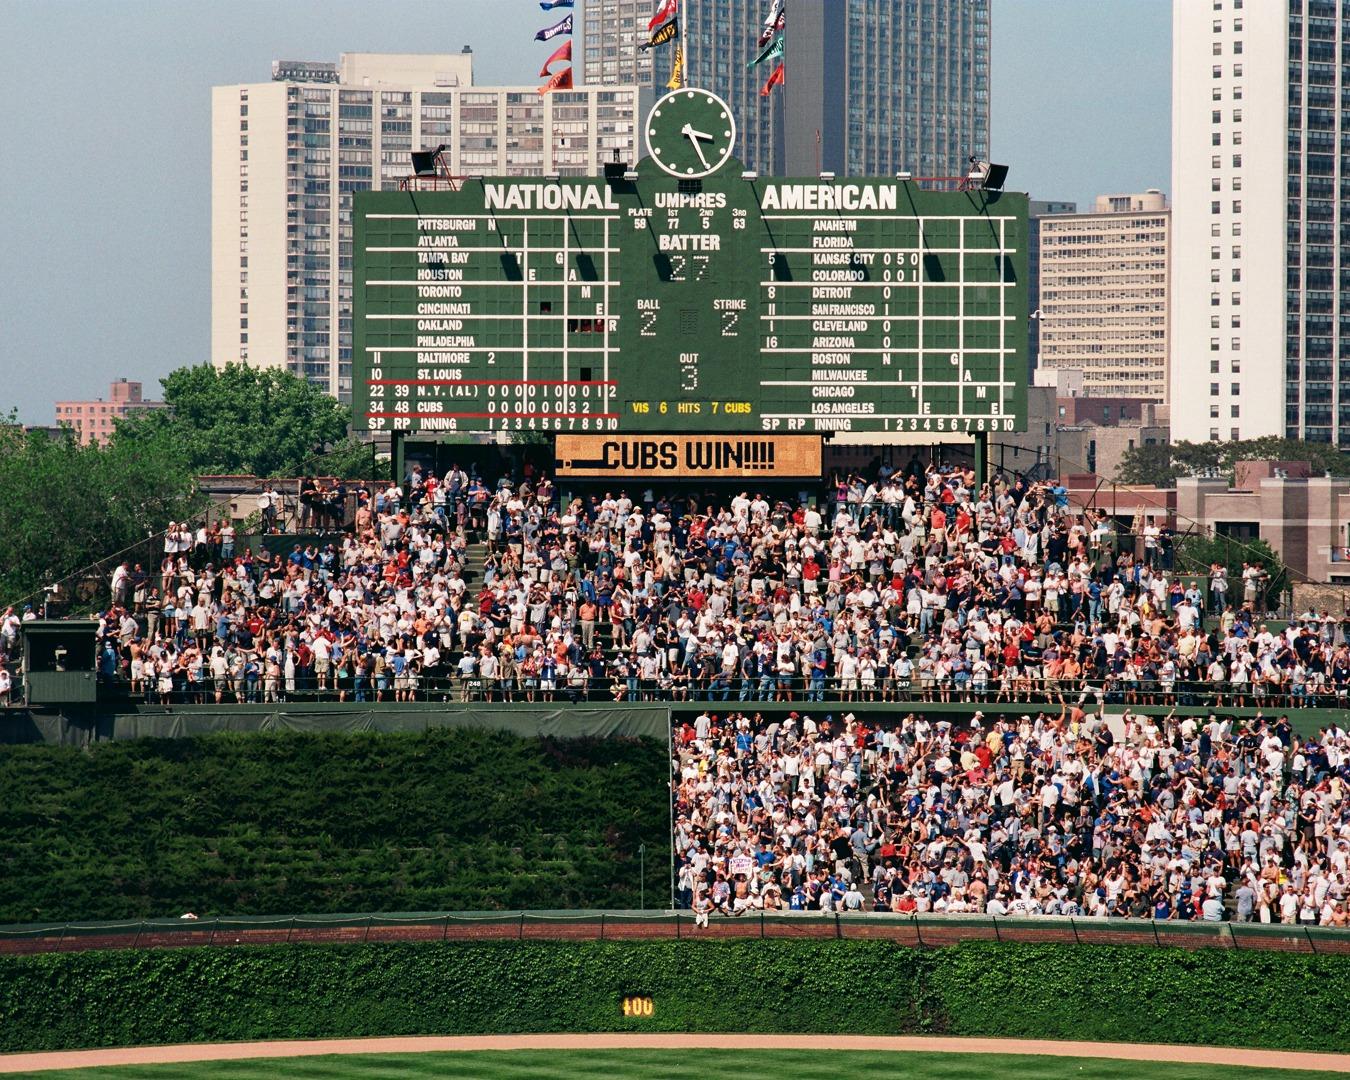 Cubs Win On Center Field Scoreboard Chicago Cubs Framed